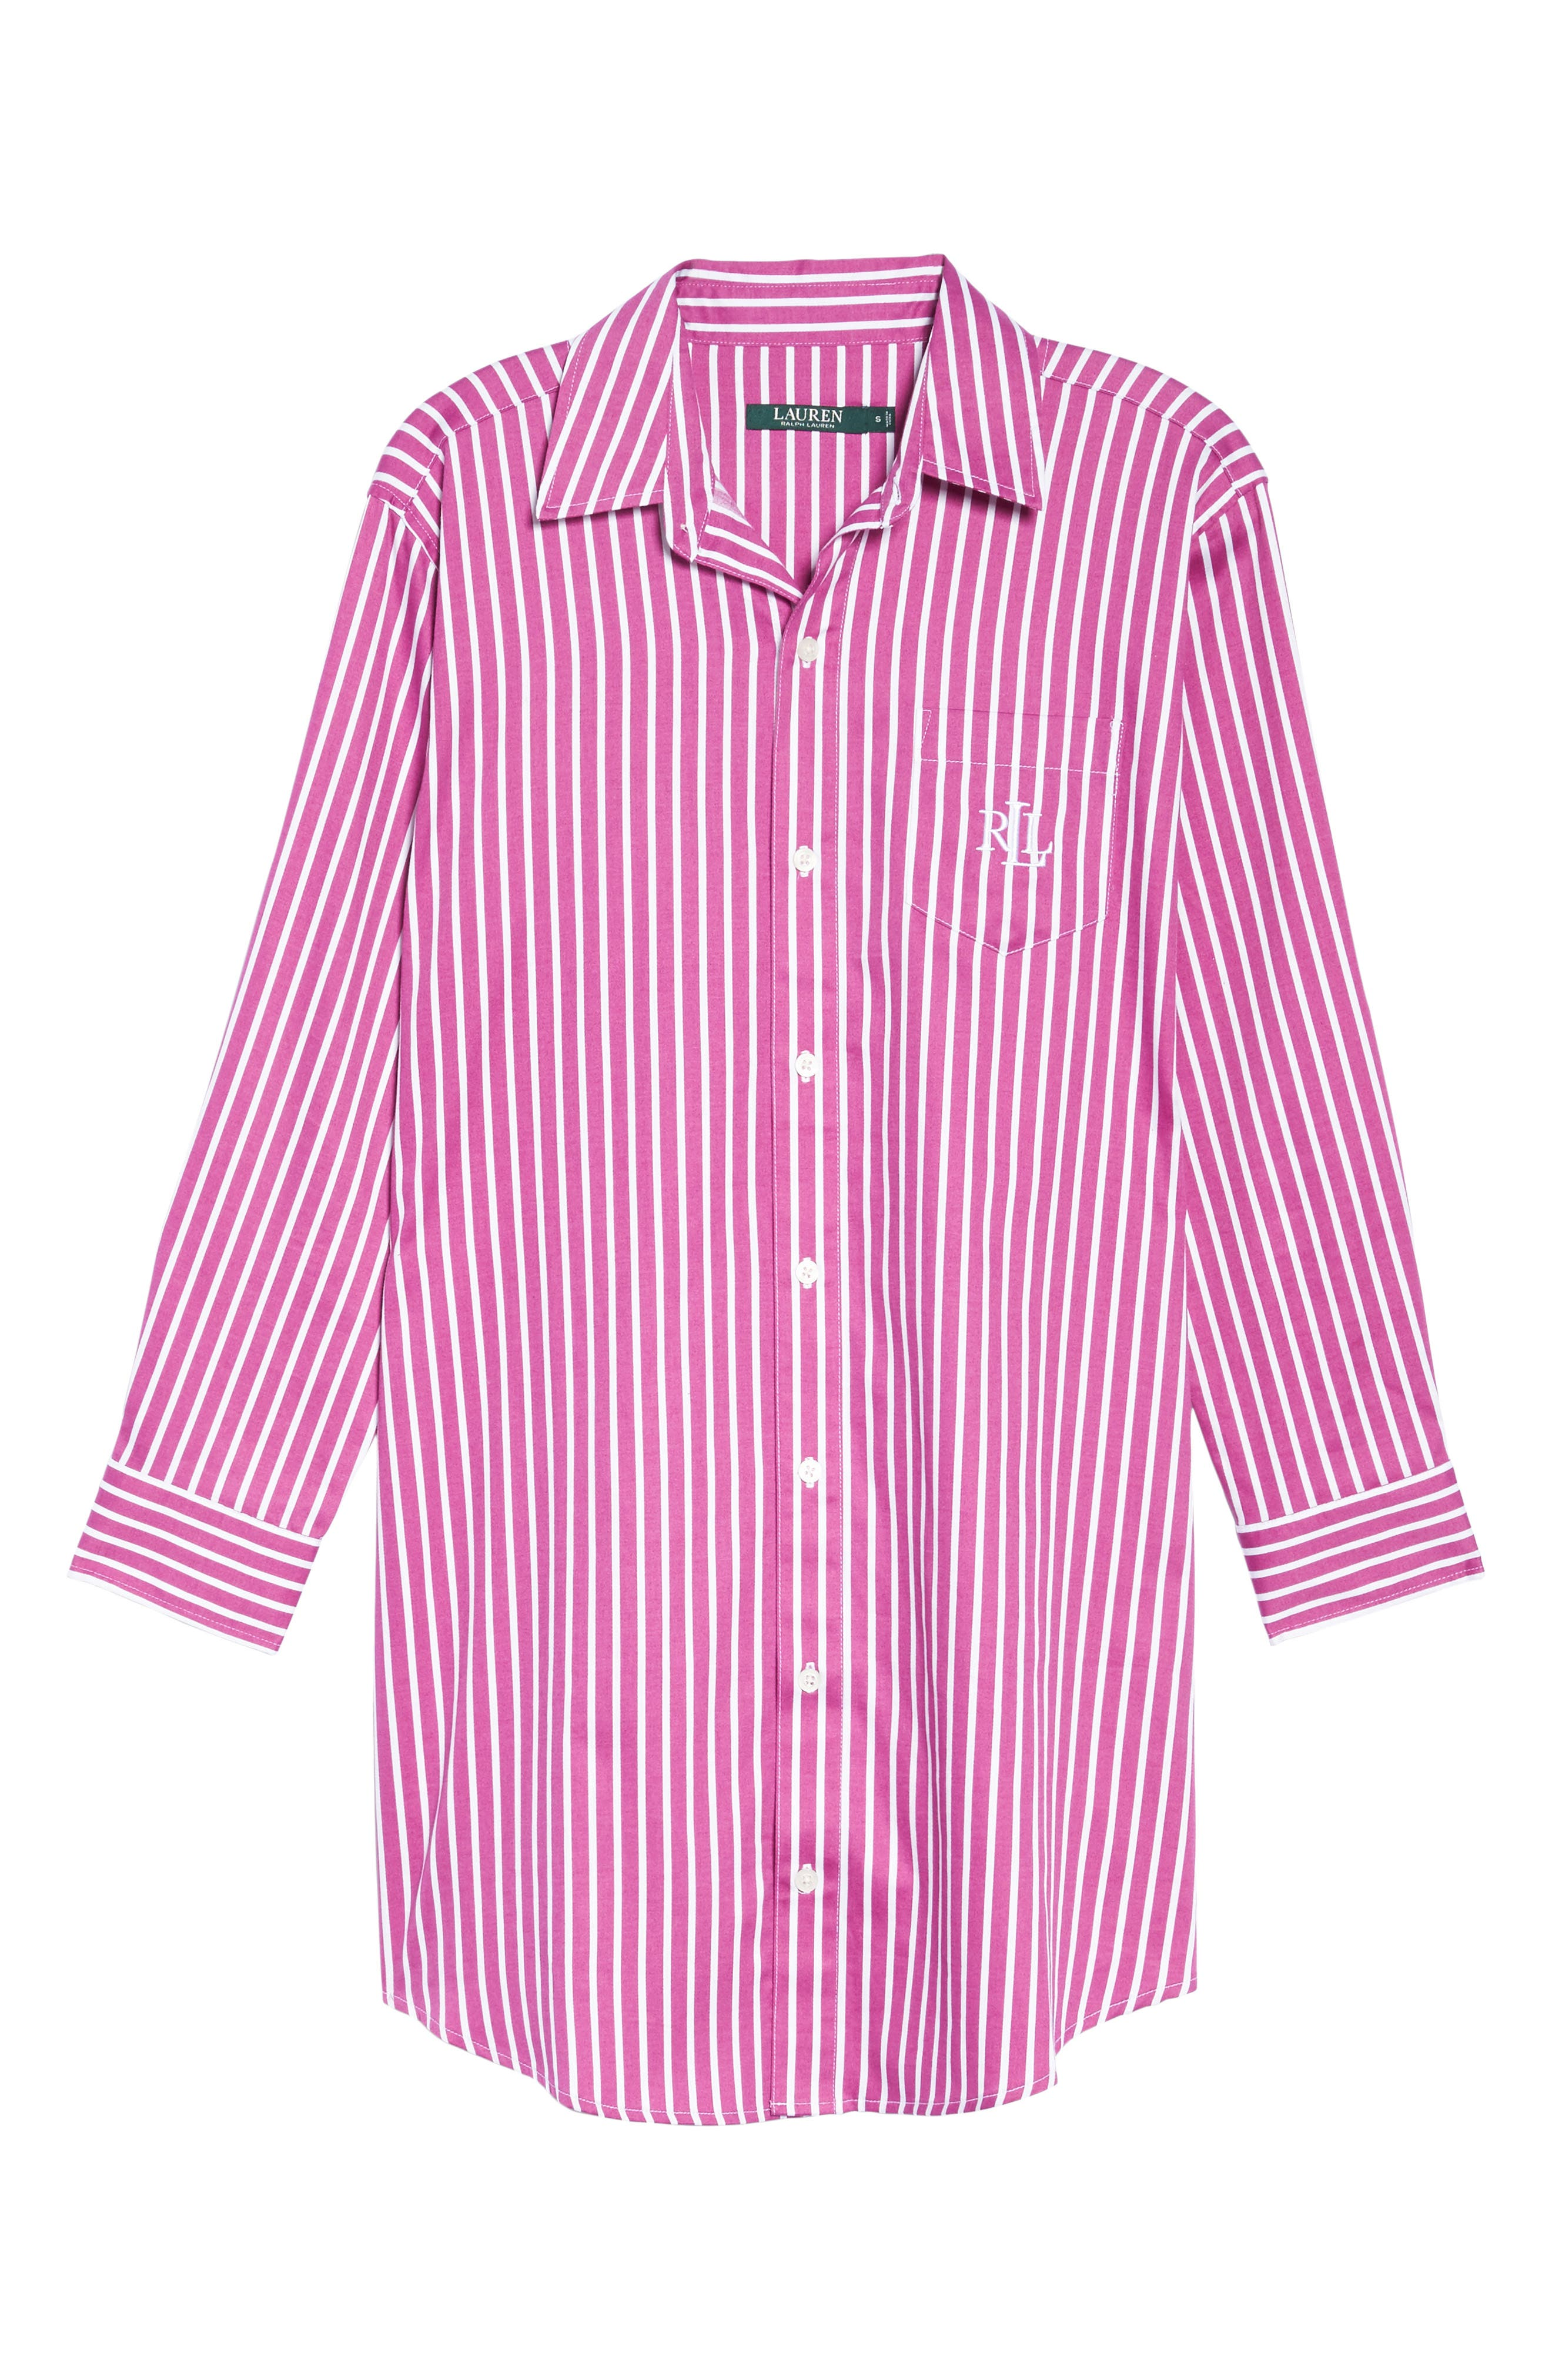 Sleep Shirt,                             Alternate thumbnail 6, color,                             690